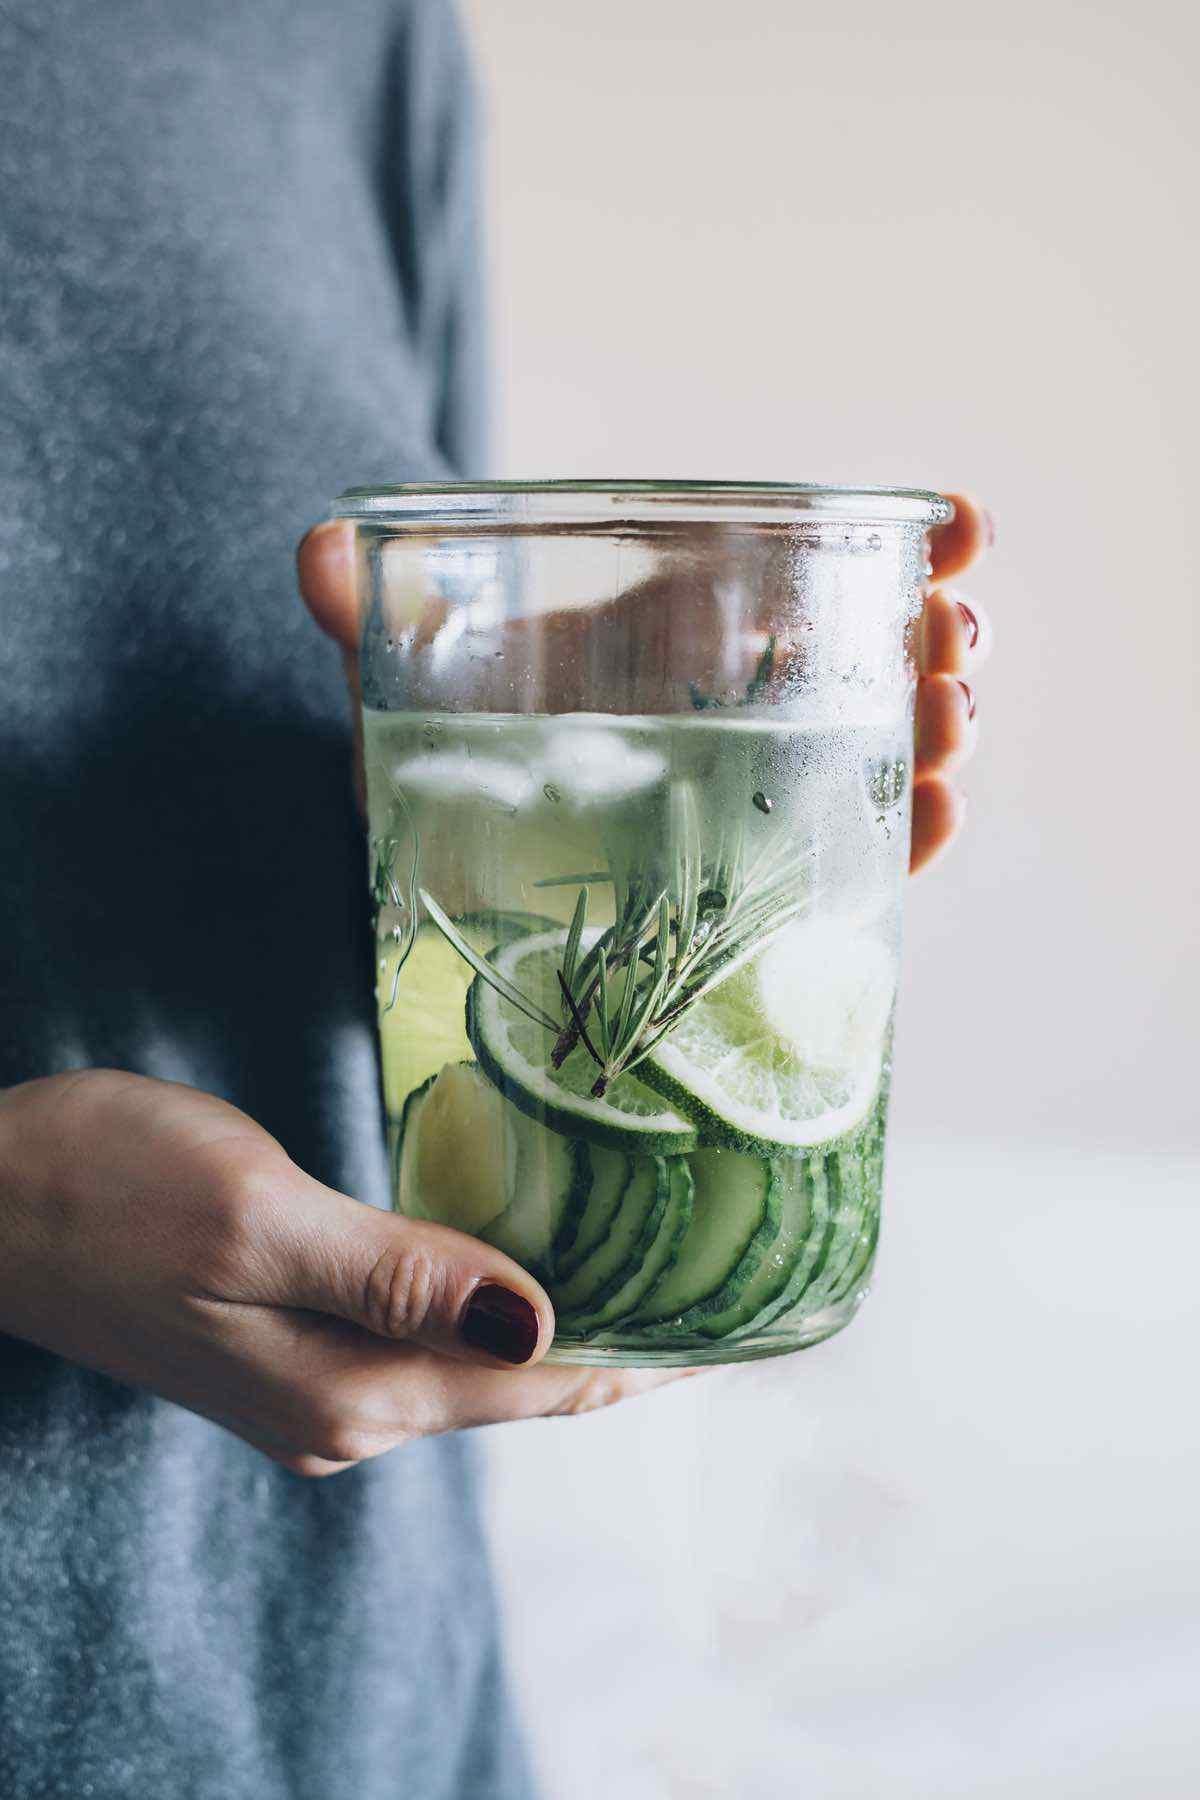 detox water to curb cravings